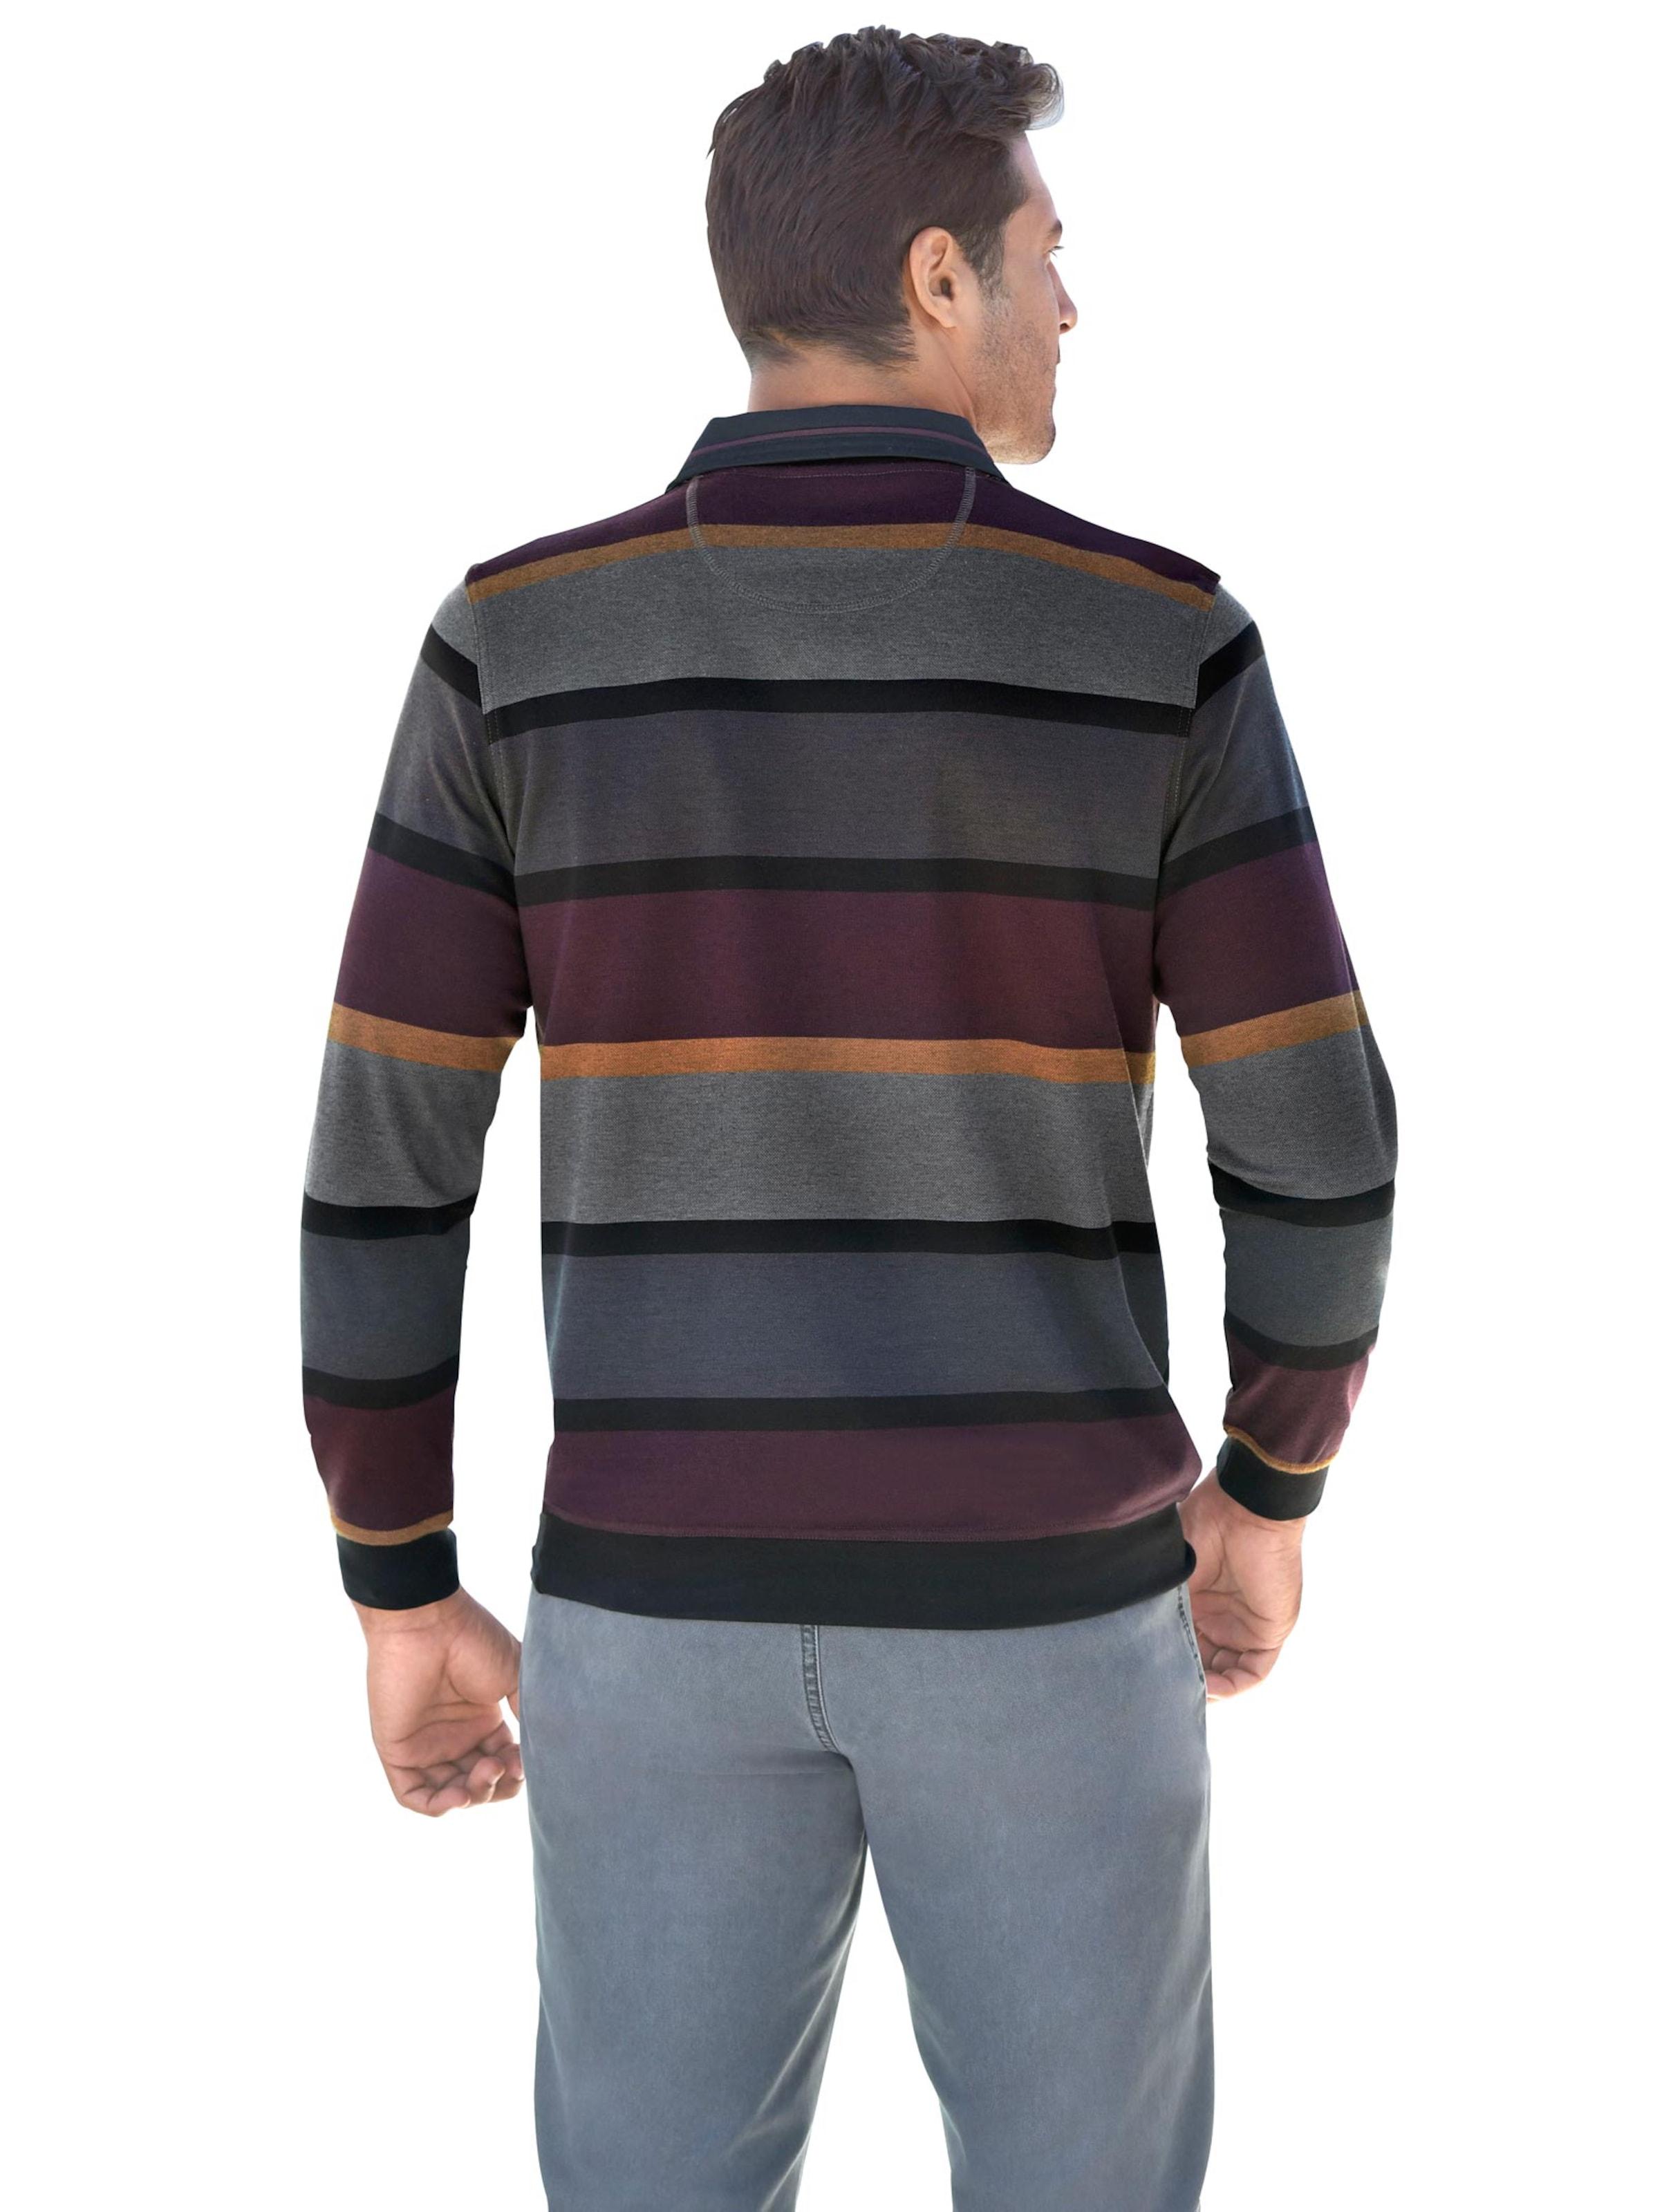 witt weiden - Herren Langarm-Shirt anthrazit-bordeaux